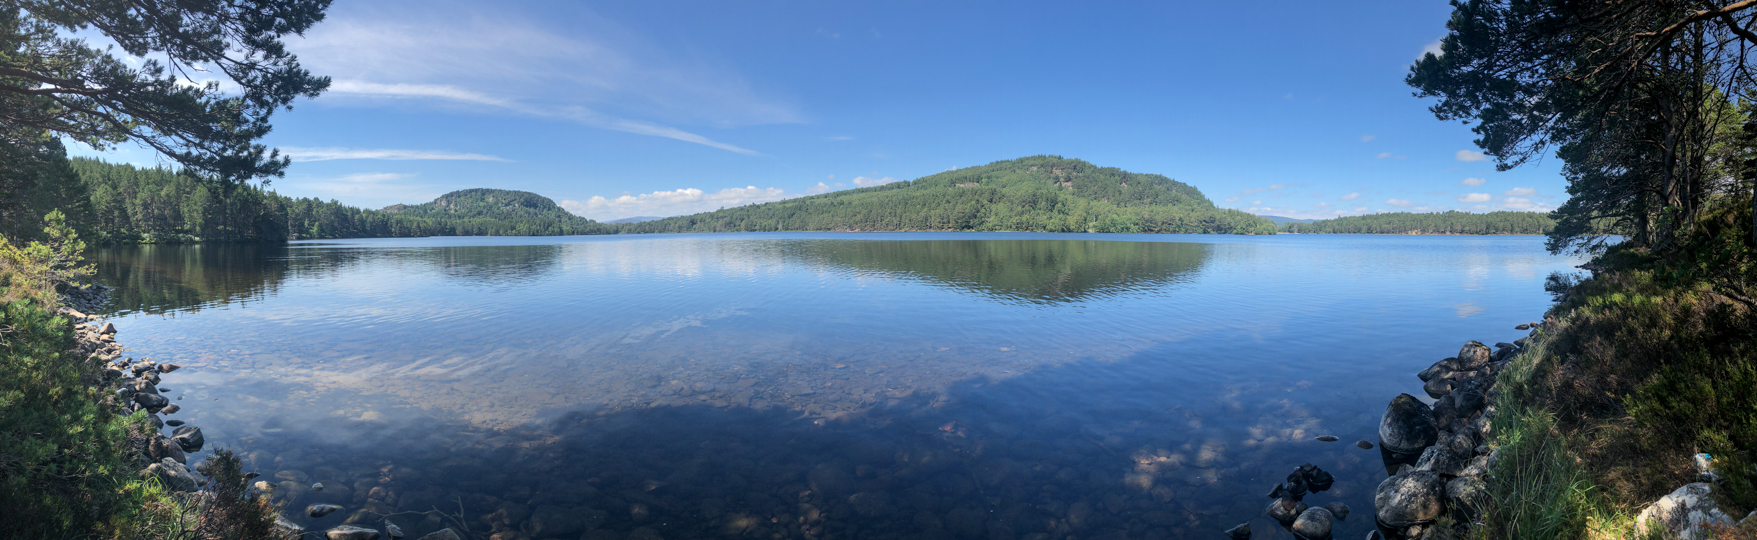 Scotland: Cairngorms National Park and Loch Lomond